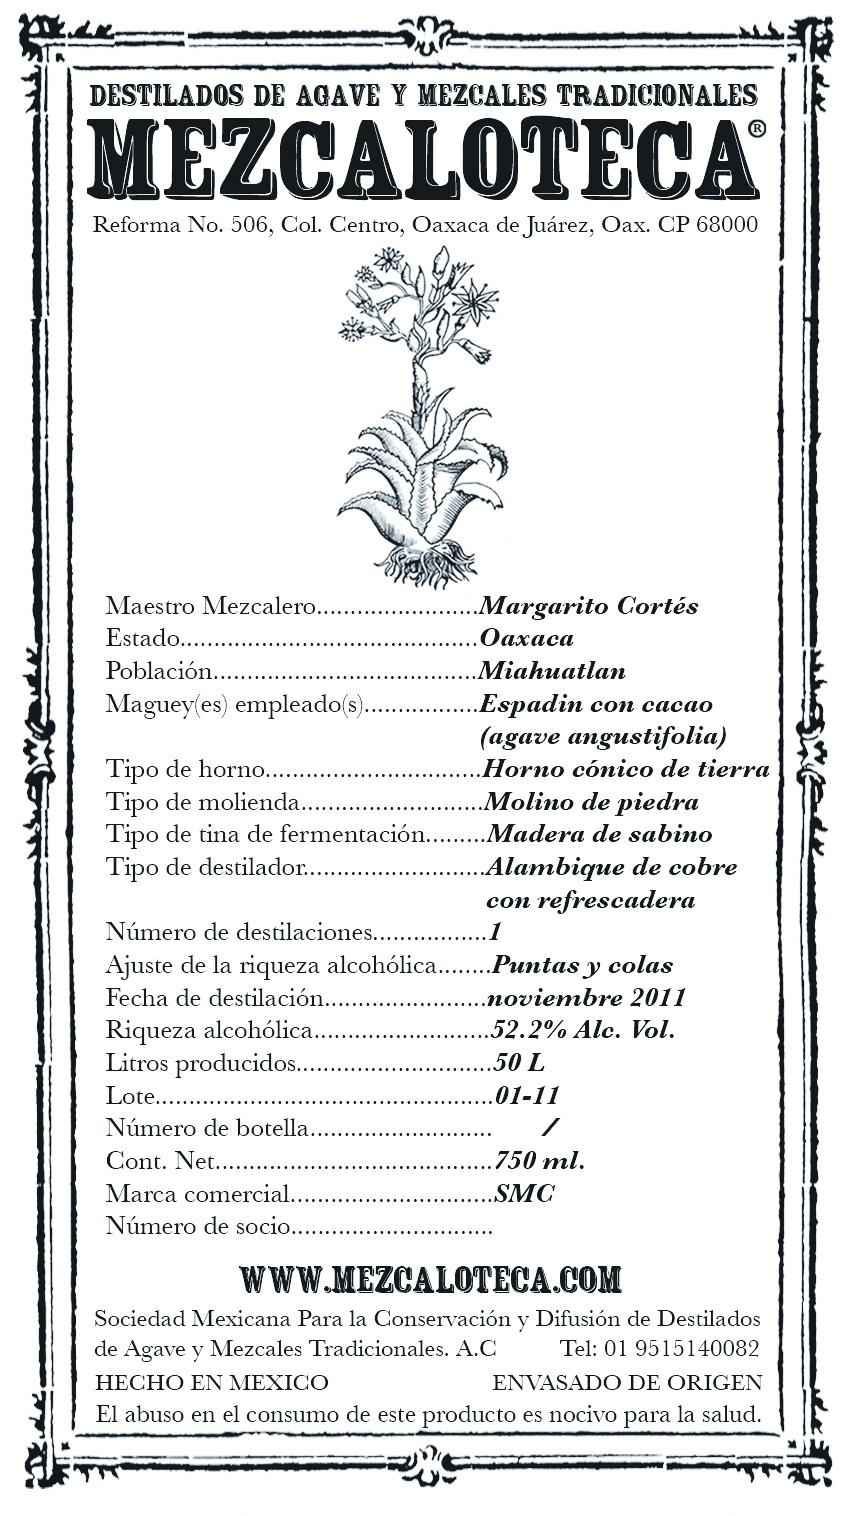 espadinccacaomargarito750ml web.jpg